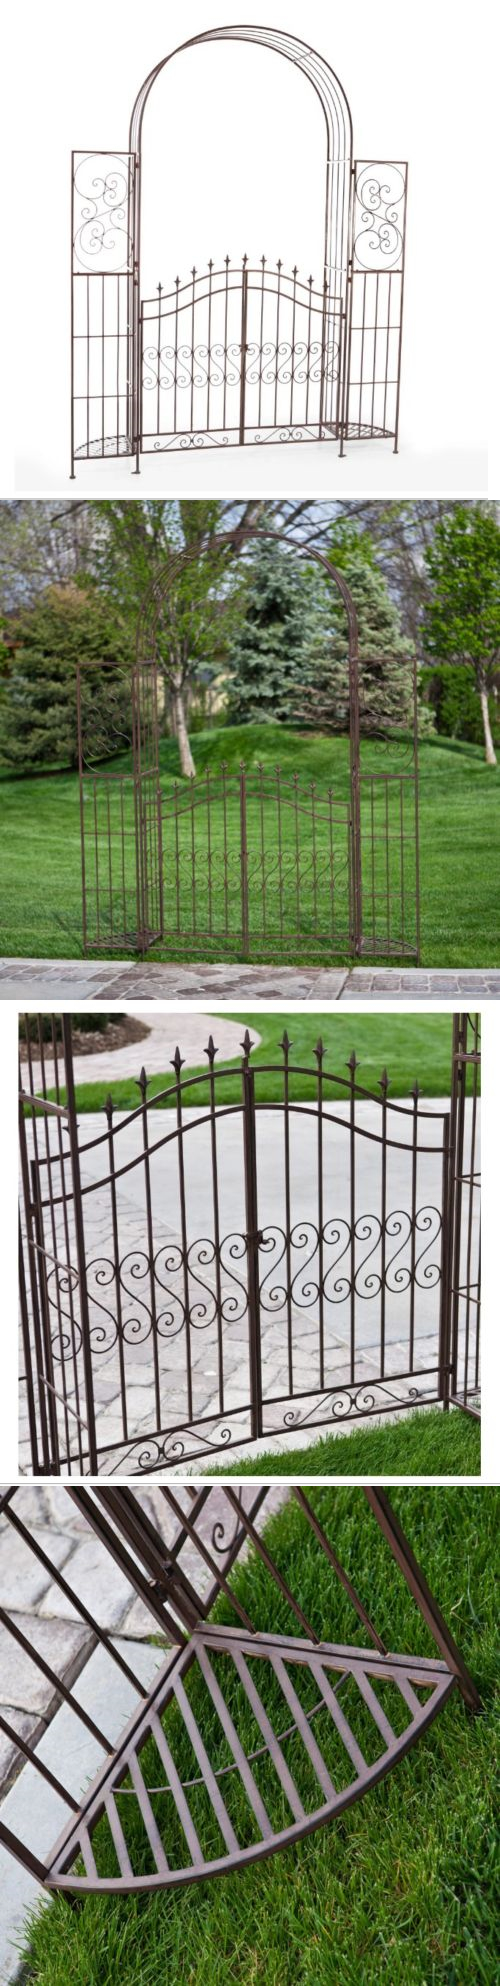 Garden decor trellis  Arbors and Arches  Garden Arbor With Gate Trellis Plant Stand